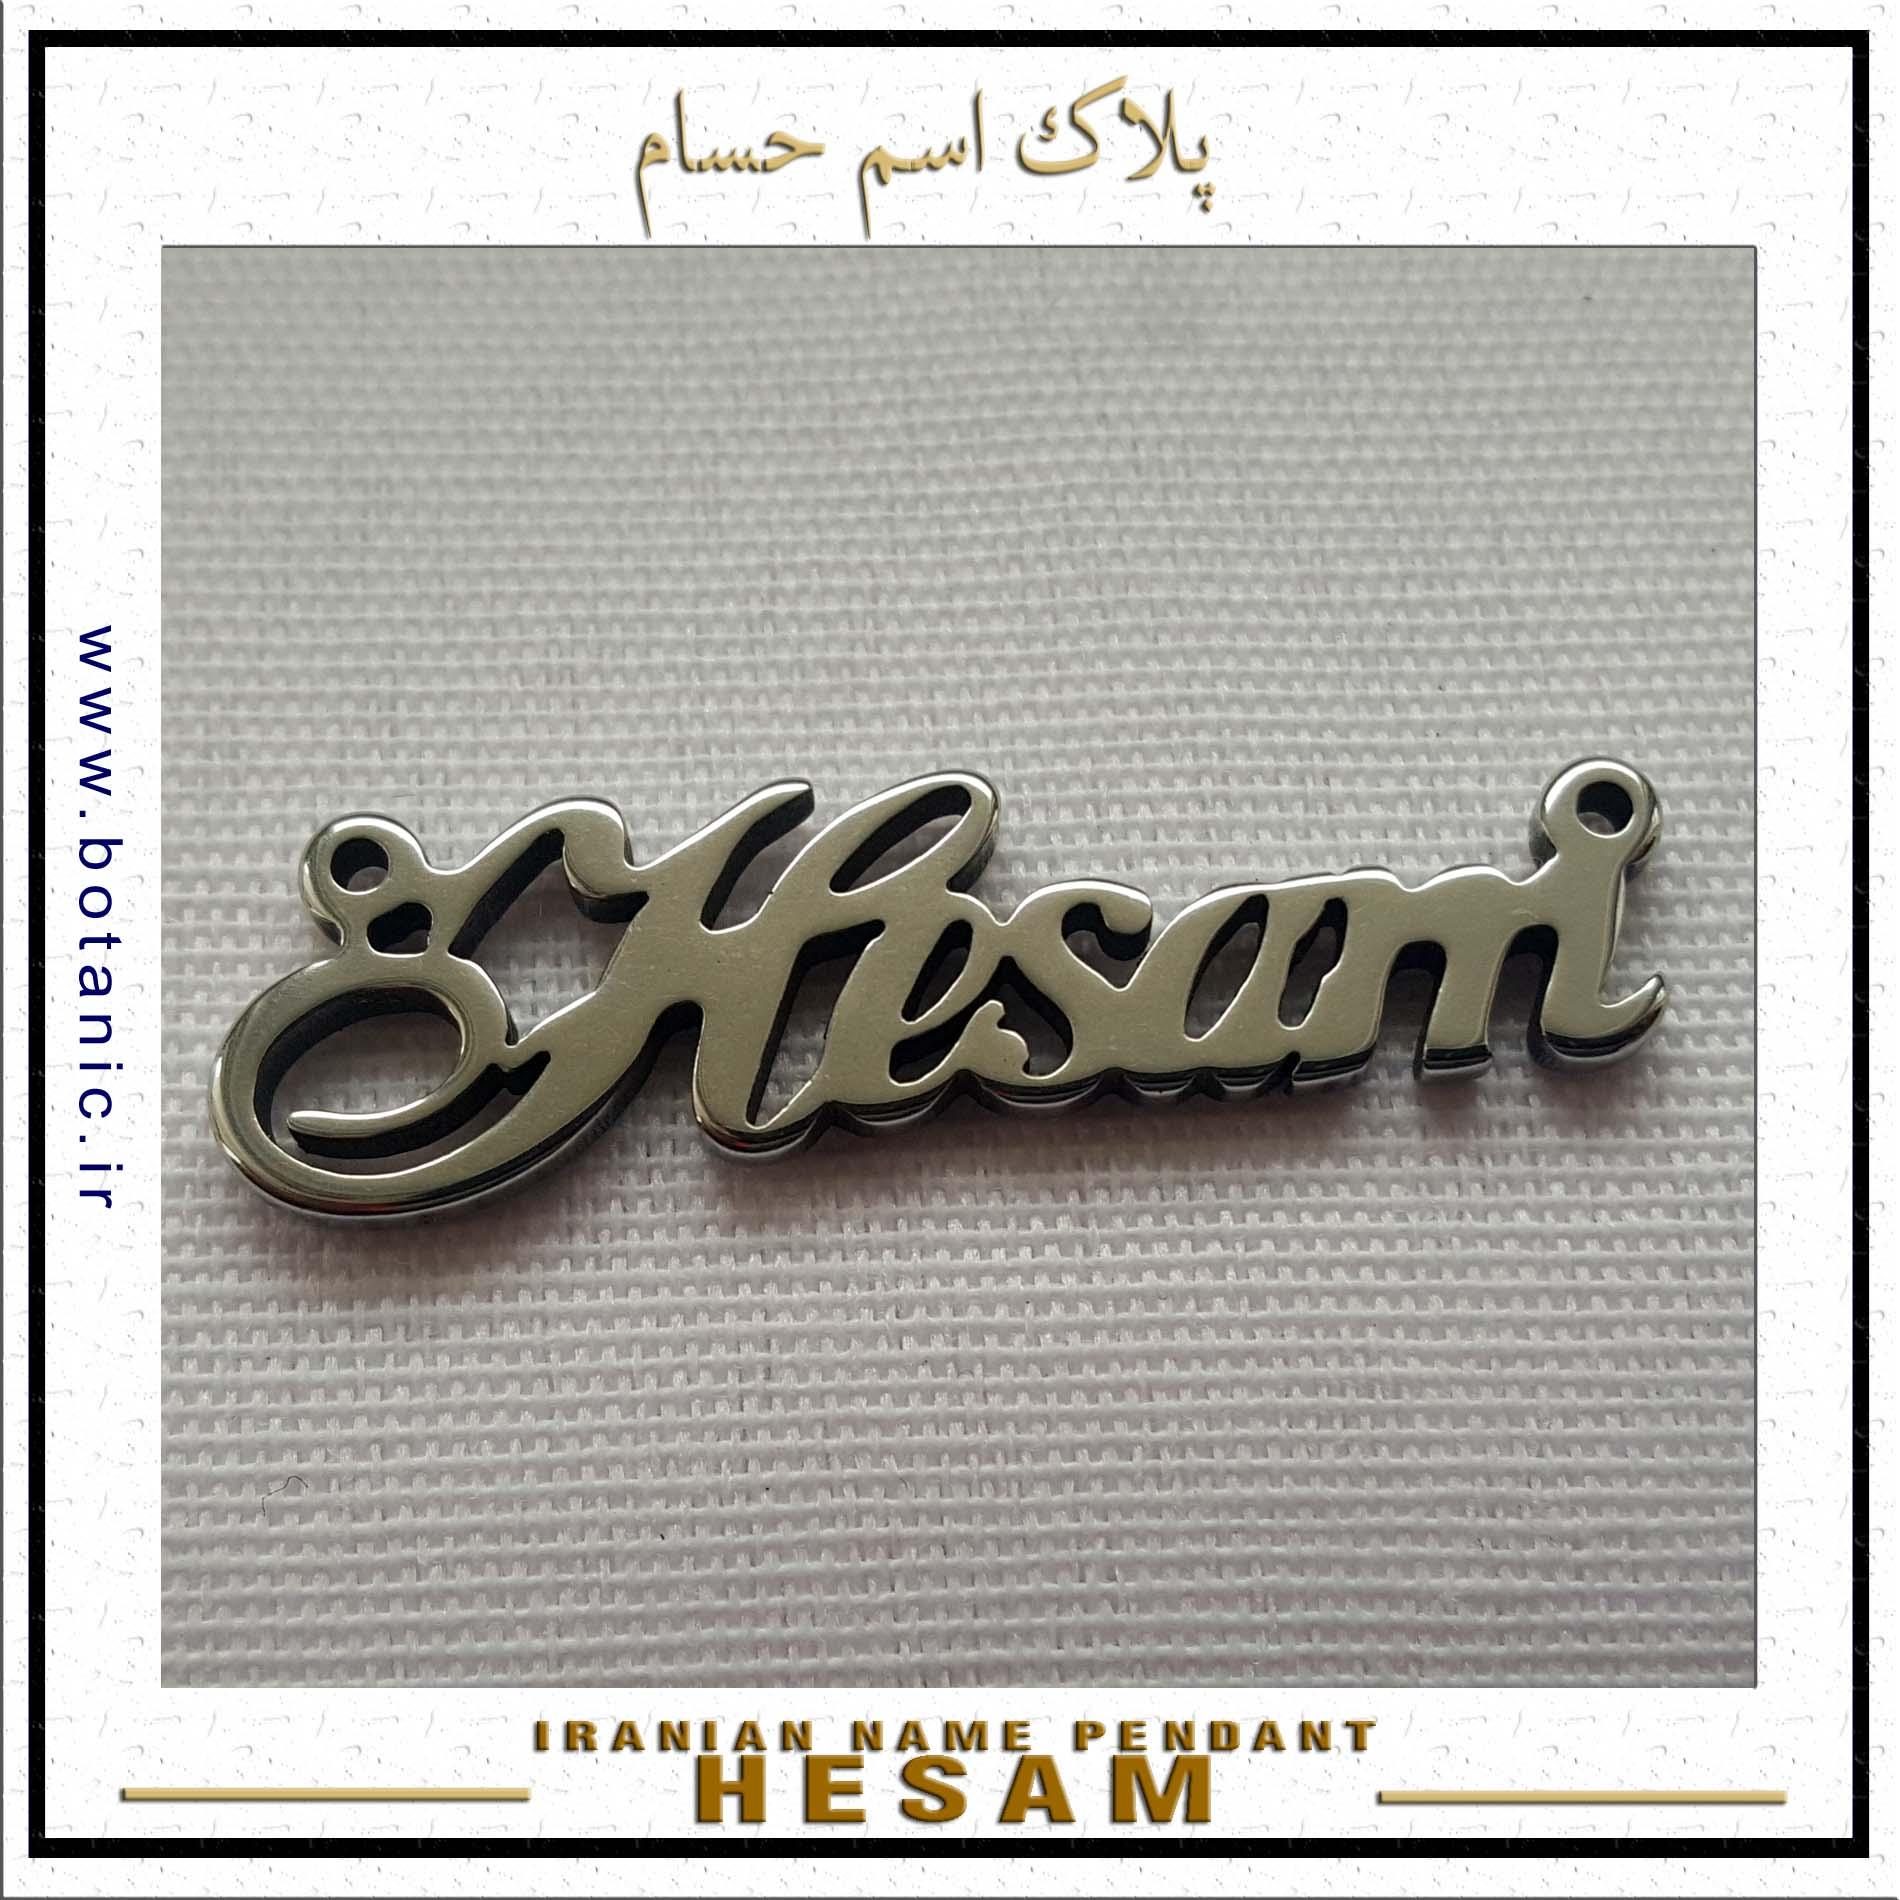 Iranian Name Pendant Hesam